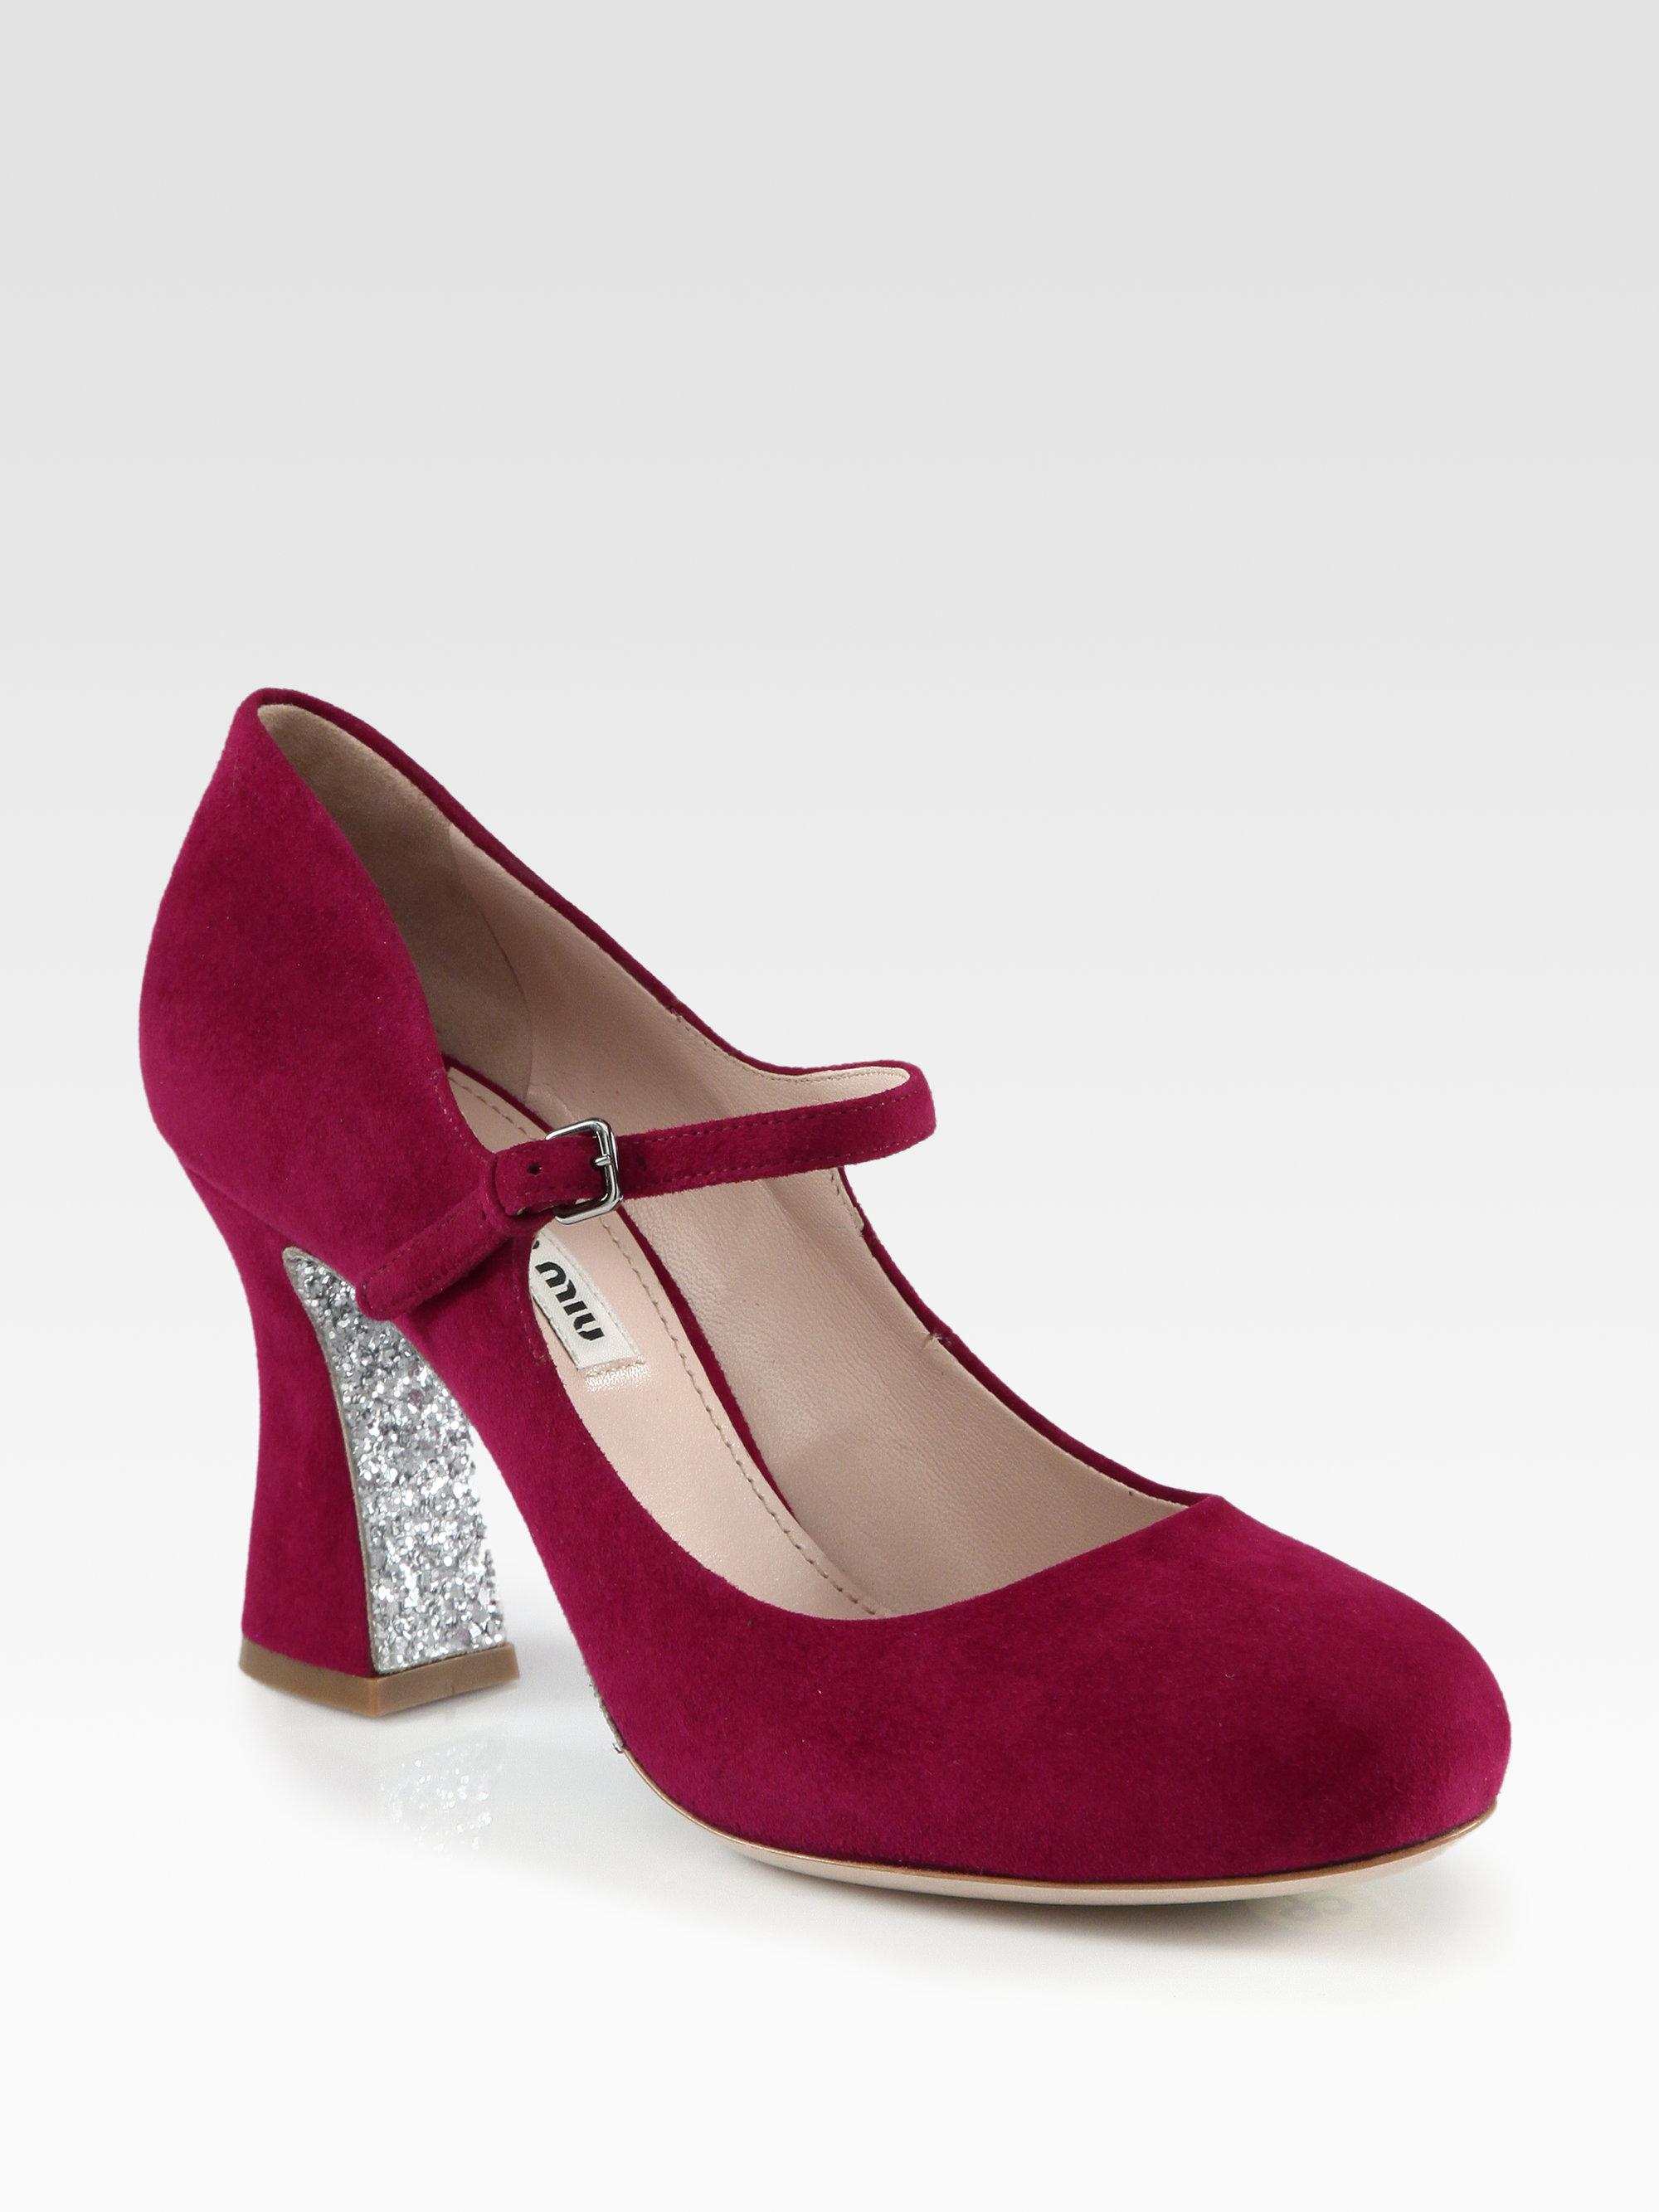 Vionnet: Clothing, Shoes & Accessories | eBay